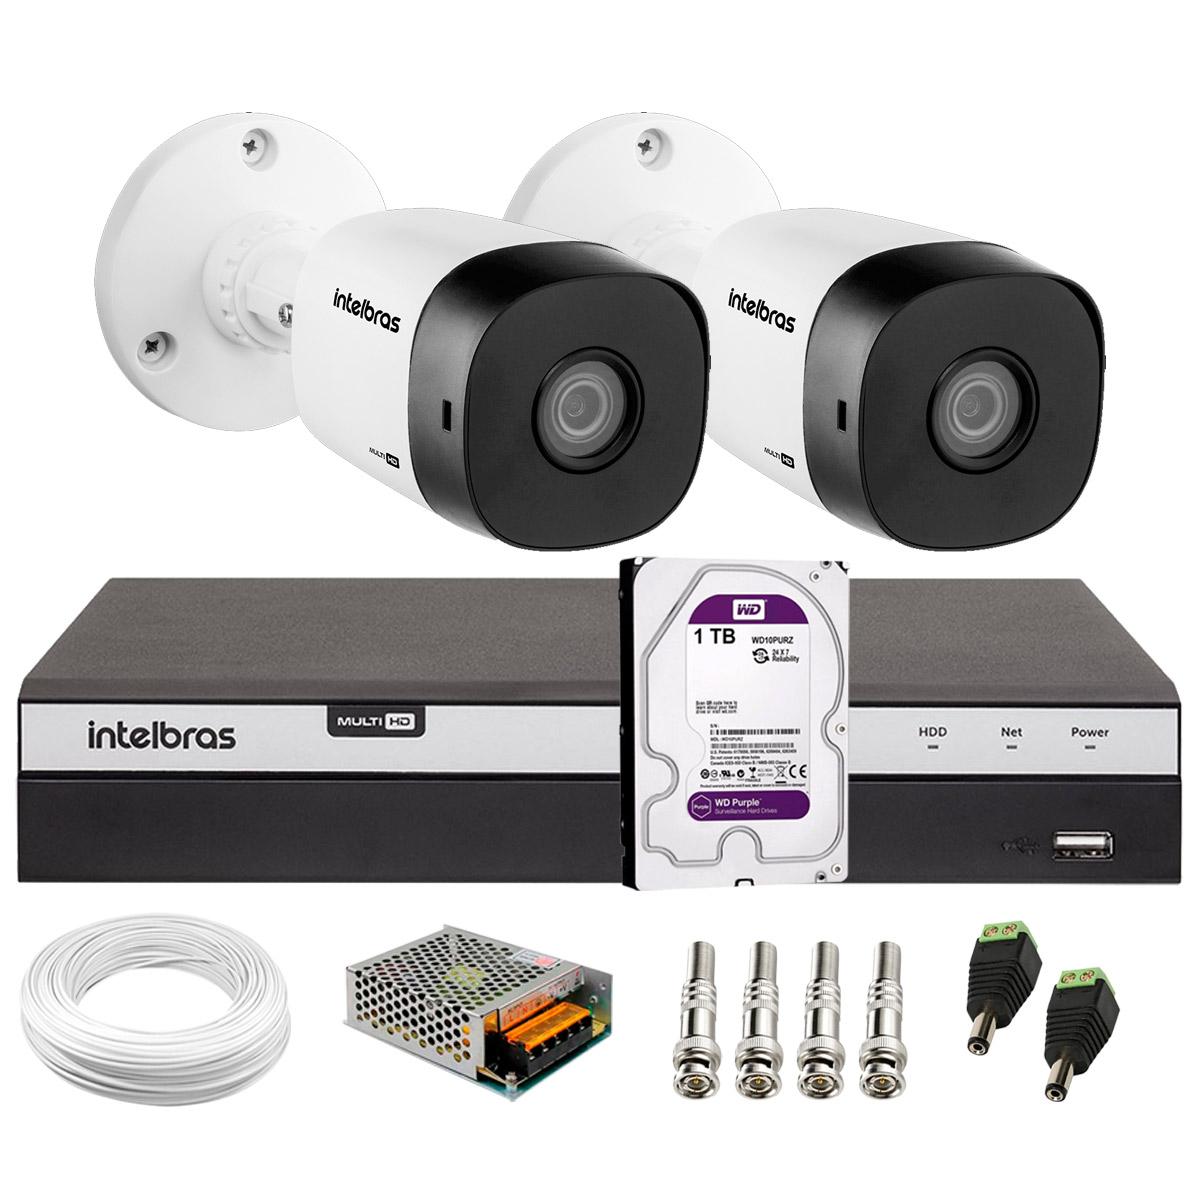 kit-8-cameras-de-seguranca-full-hd-intelbras-vhd-1220-b-g6-dvr-intelbras-full-hd-mhdx-3108-de-8-canais-acessorios